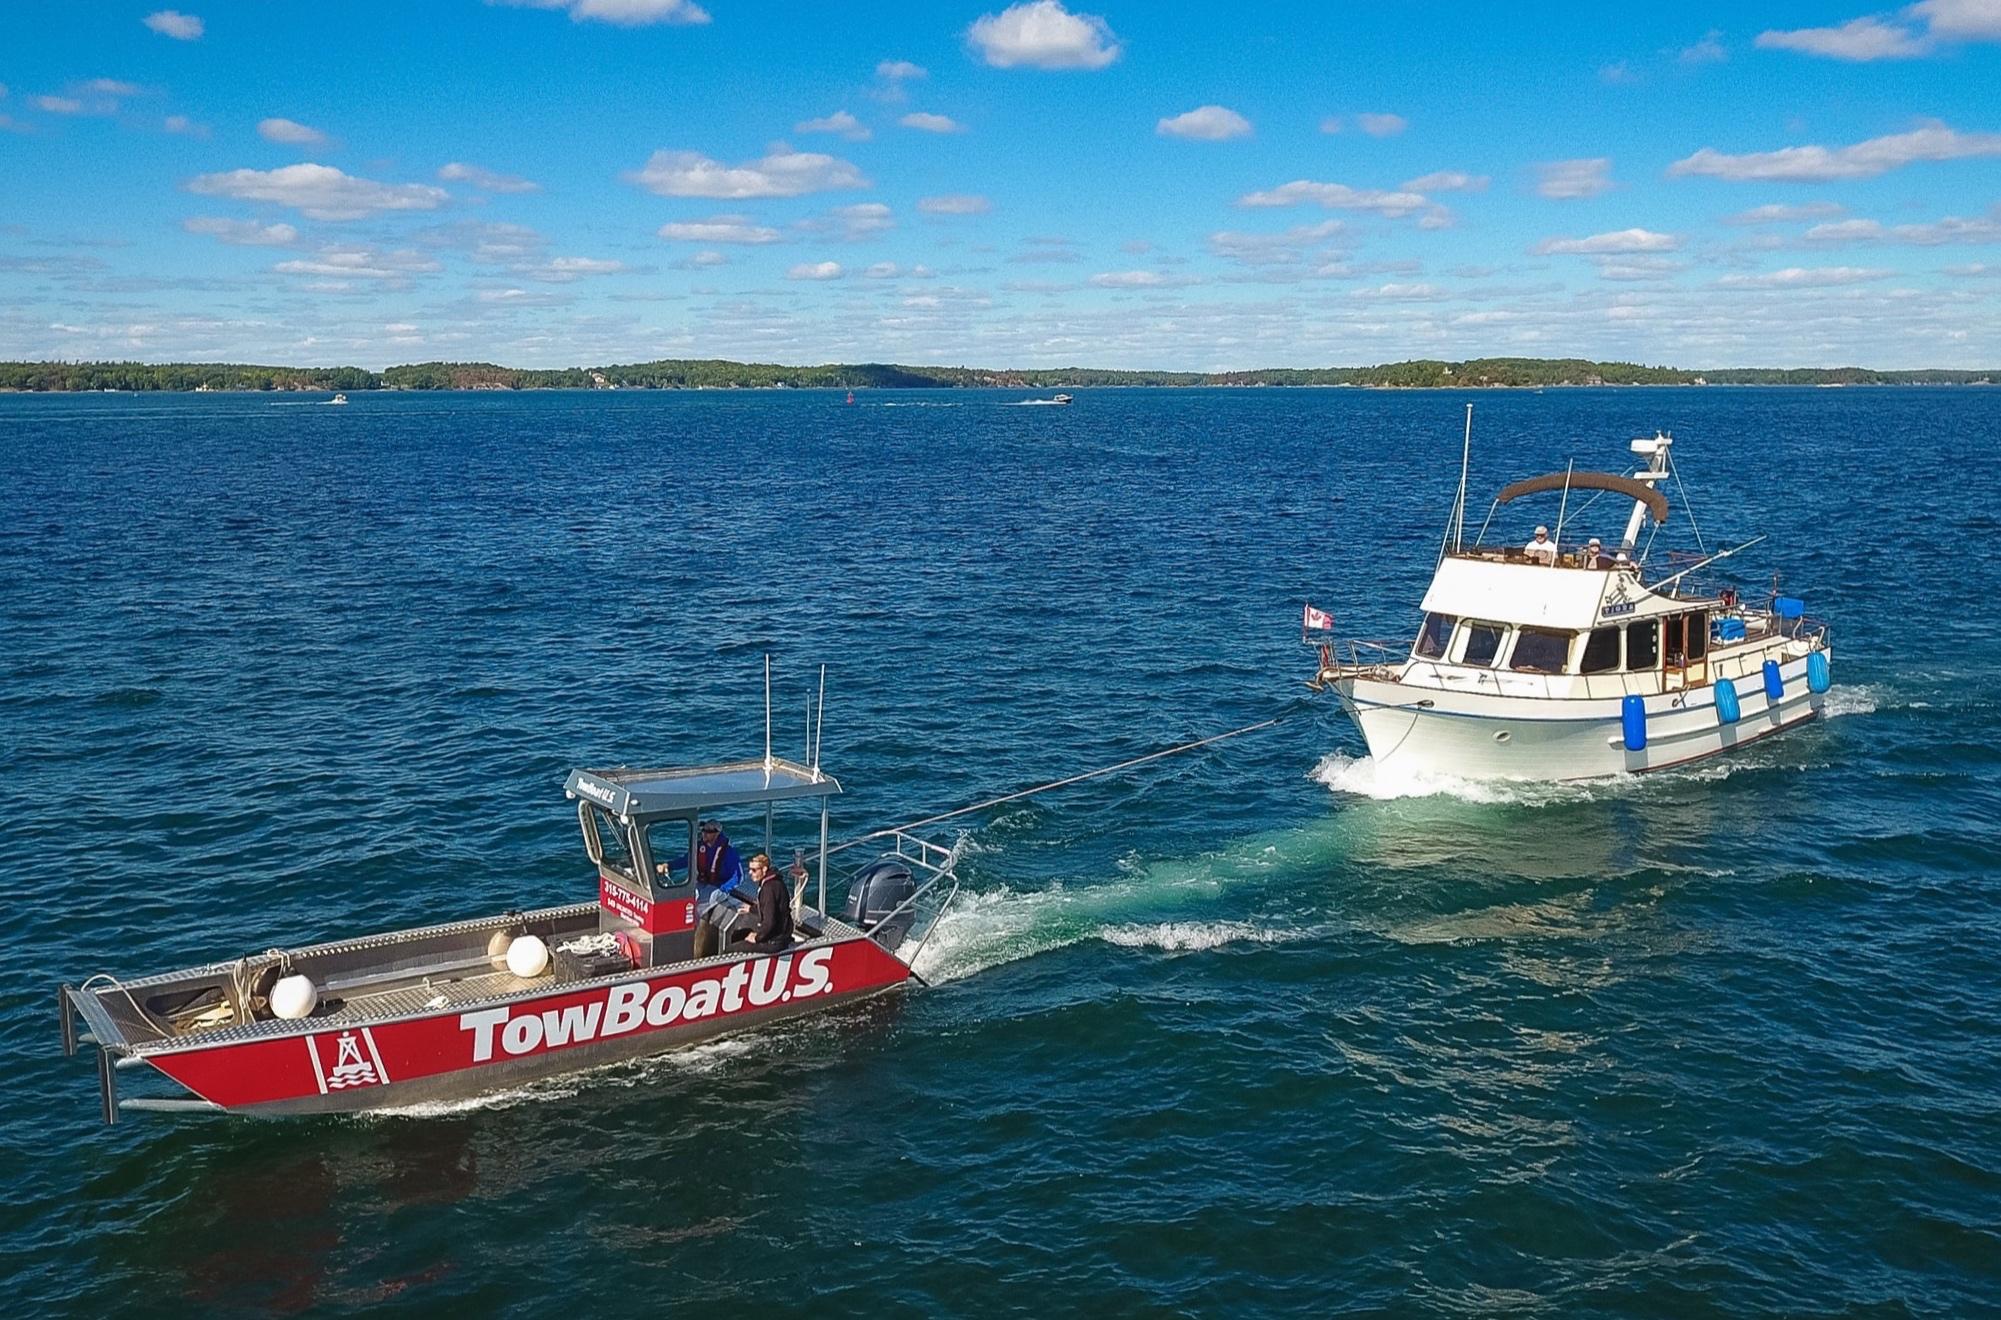 TowBoatU.S. Clayton, towing, boats, broken down boat, Thousand Islands